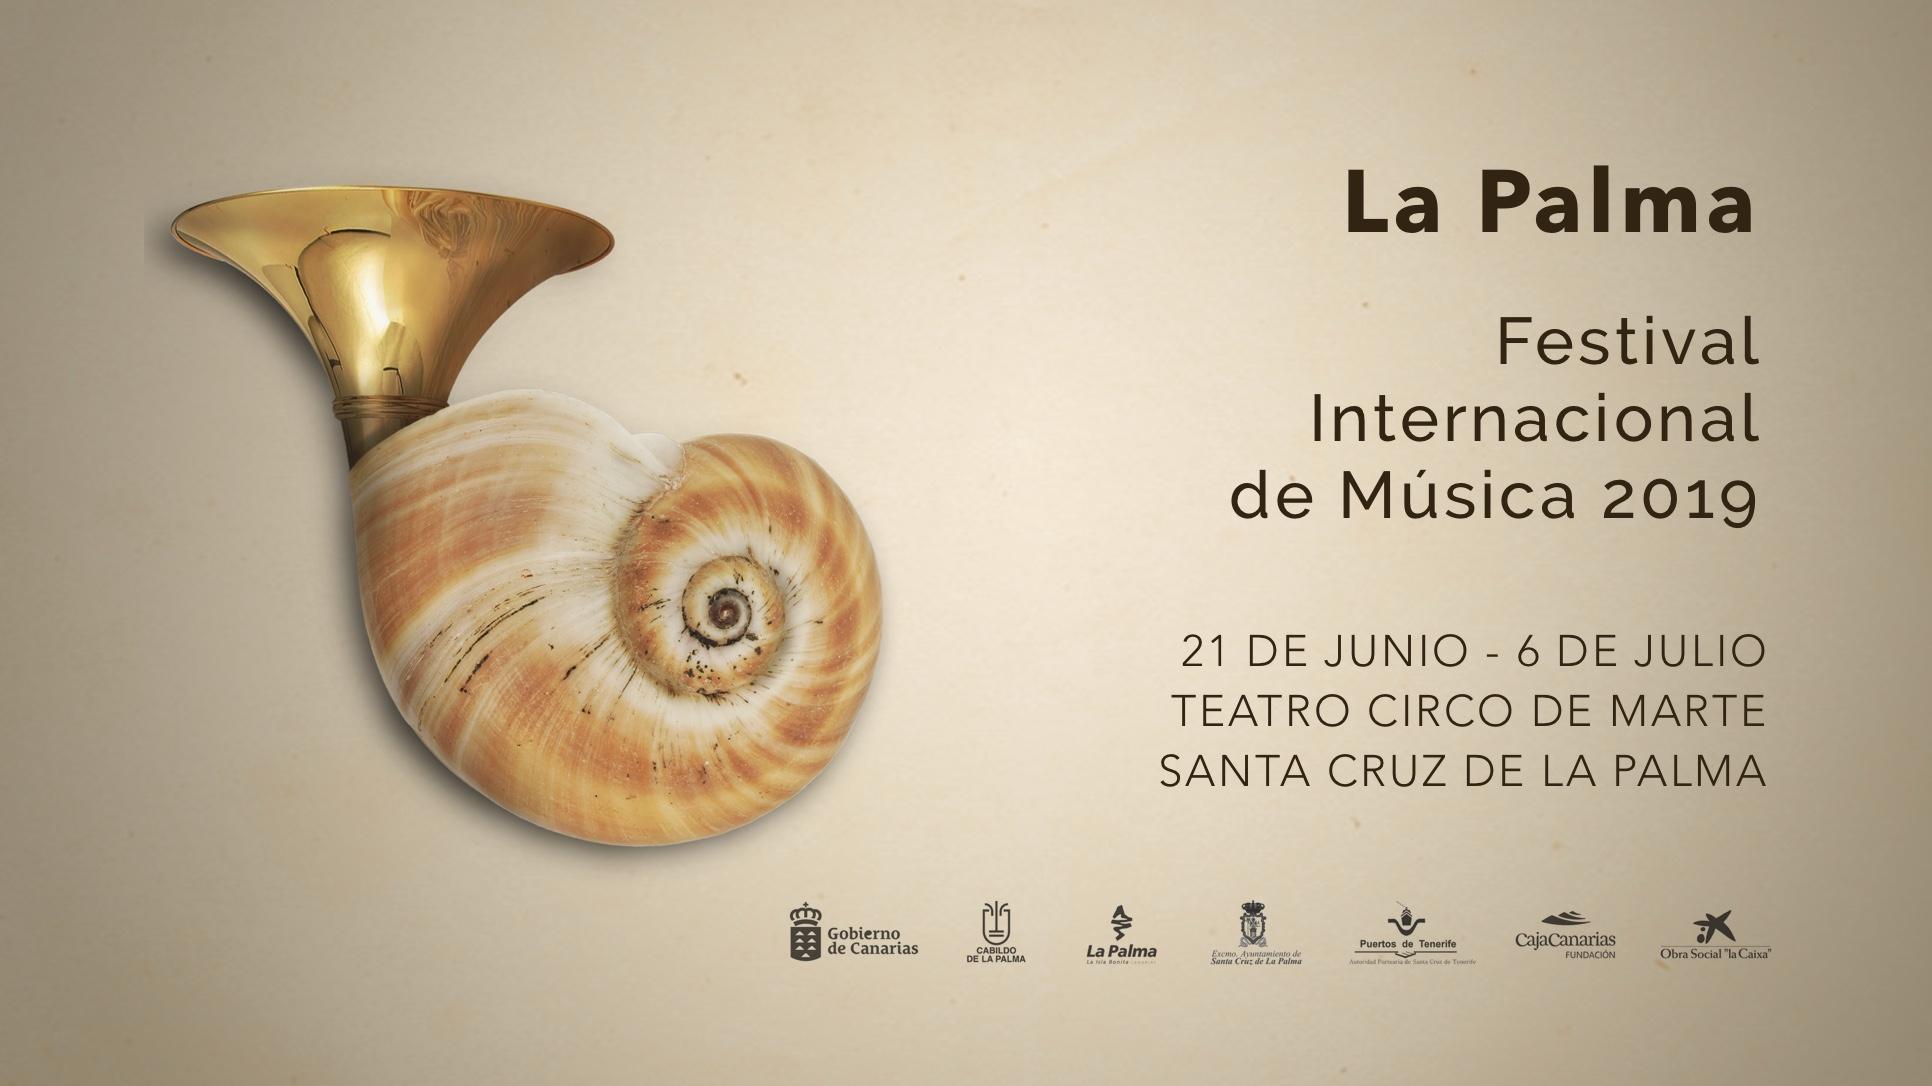 La Palma Festival Internacional de Música